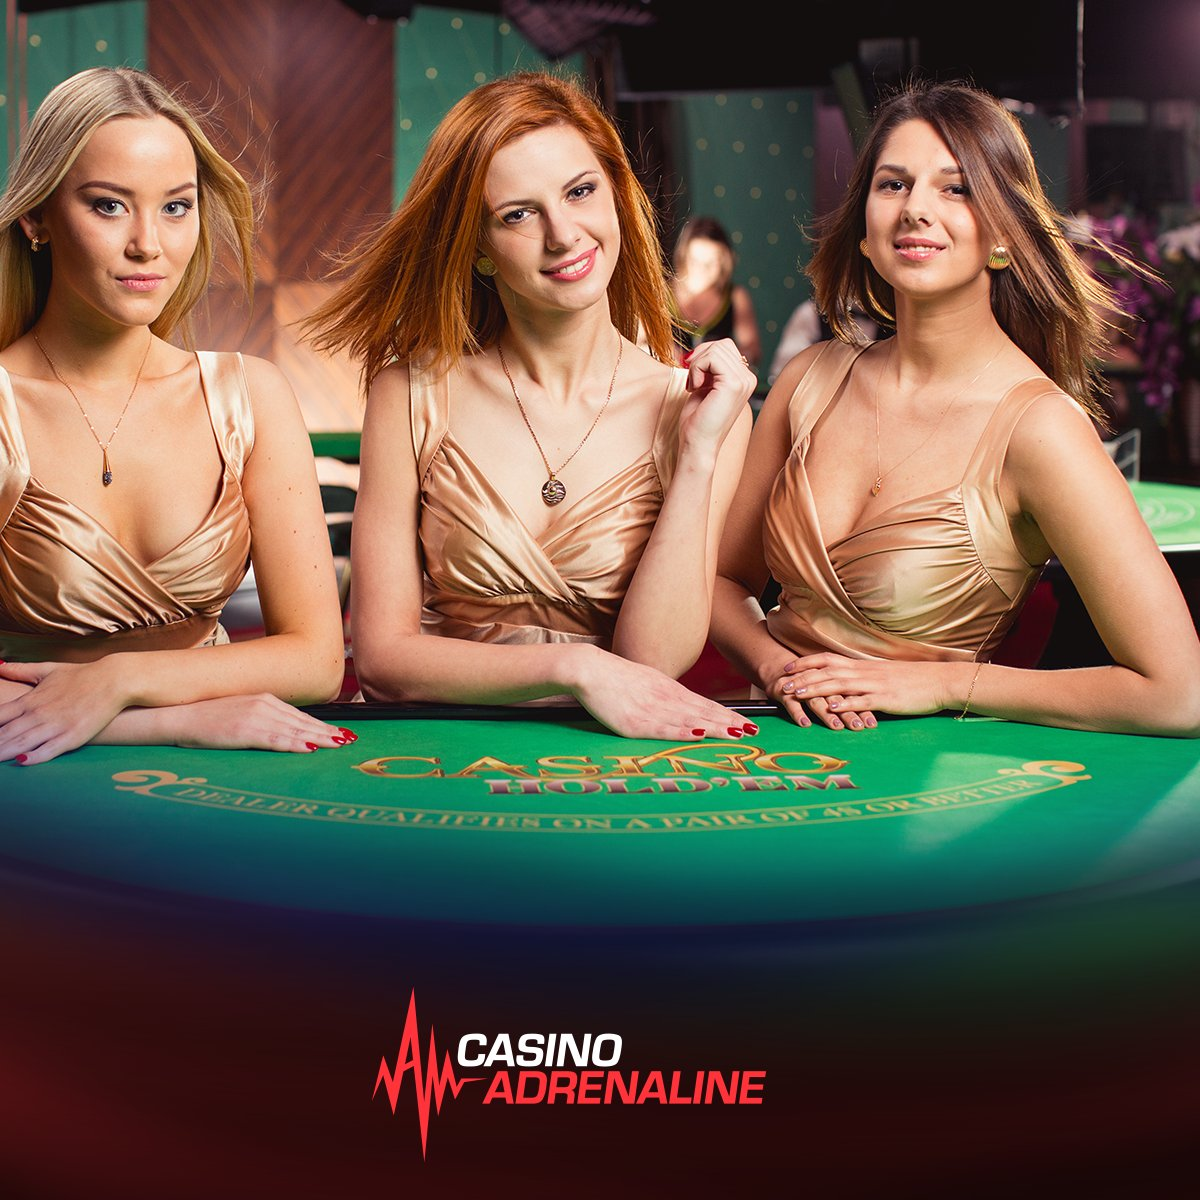 test Twitter Media - Enjoy the real live casino feeling online! https://t.co/oSXfIB6U5E https://t.co/PhPSYPipYU